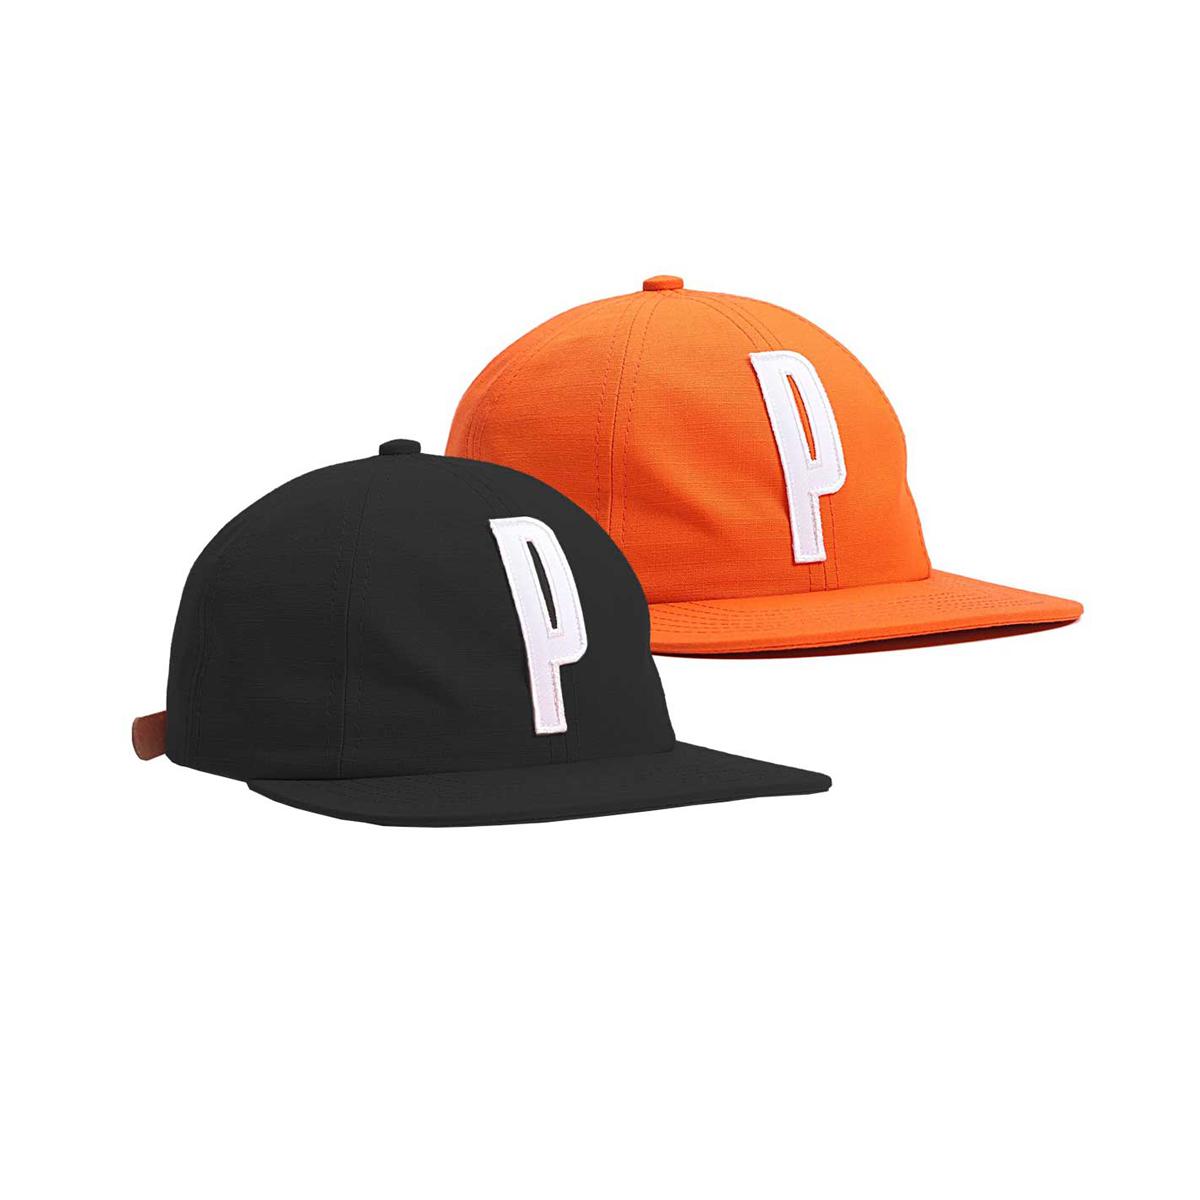 PUBLISH 8PANNEL CAP HOMER パブリッシュ キャップ